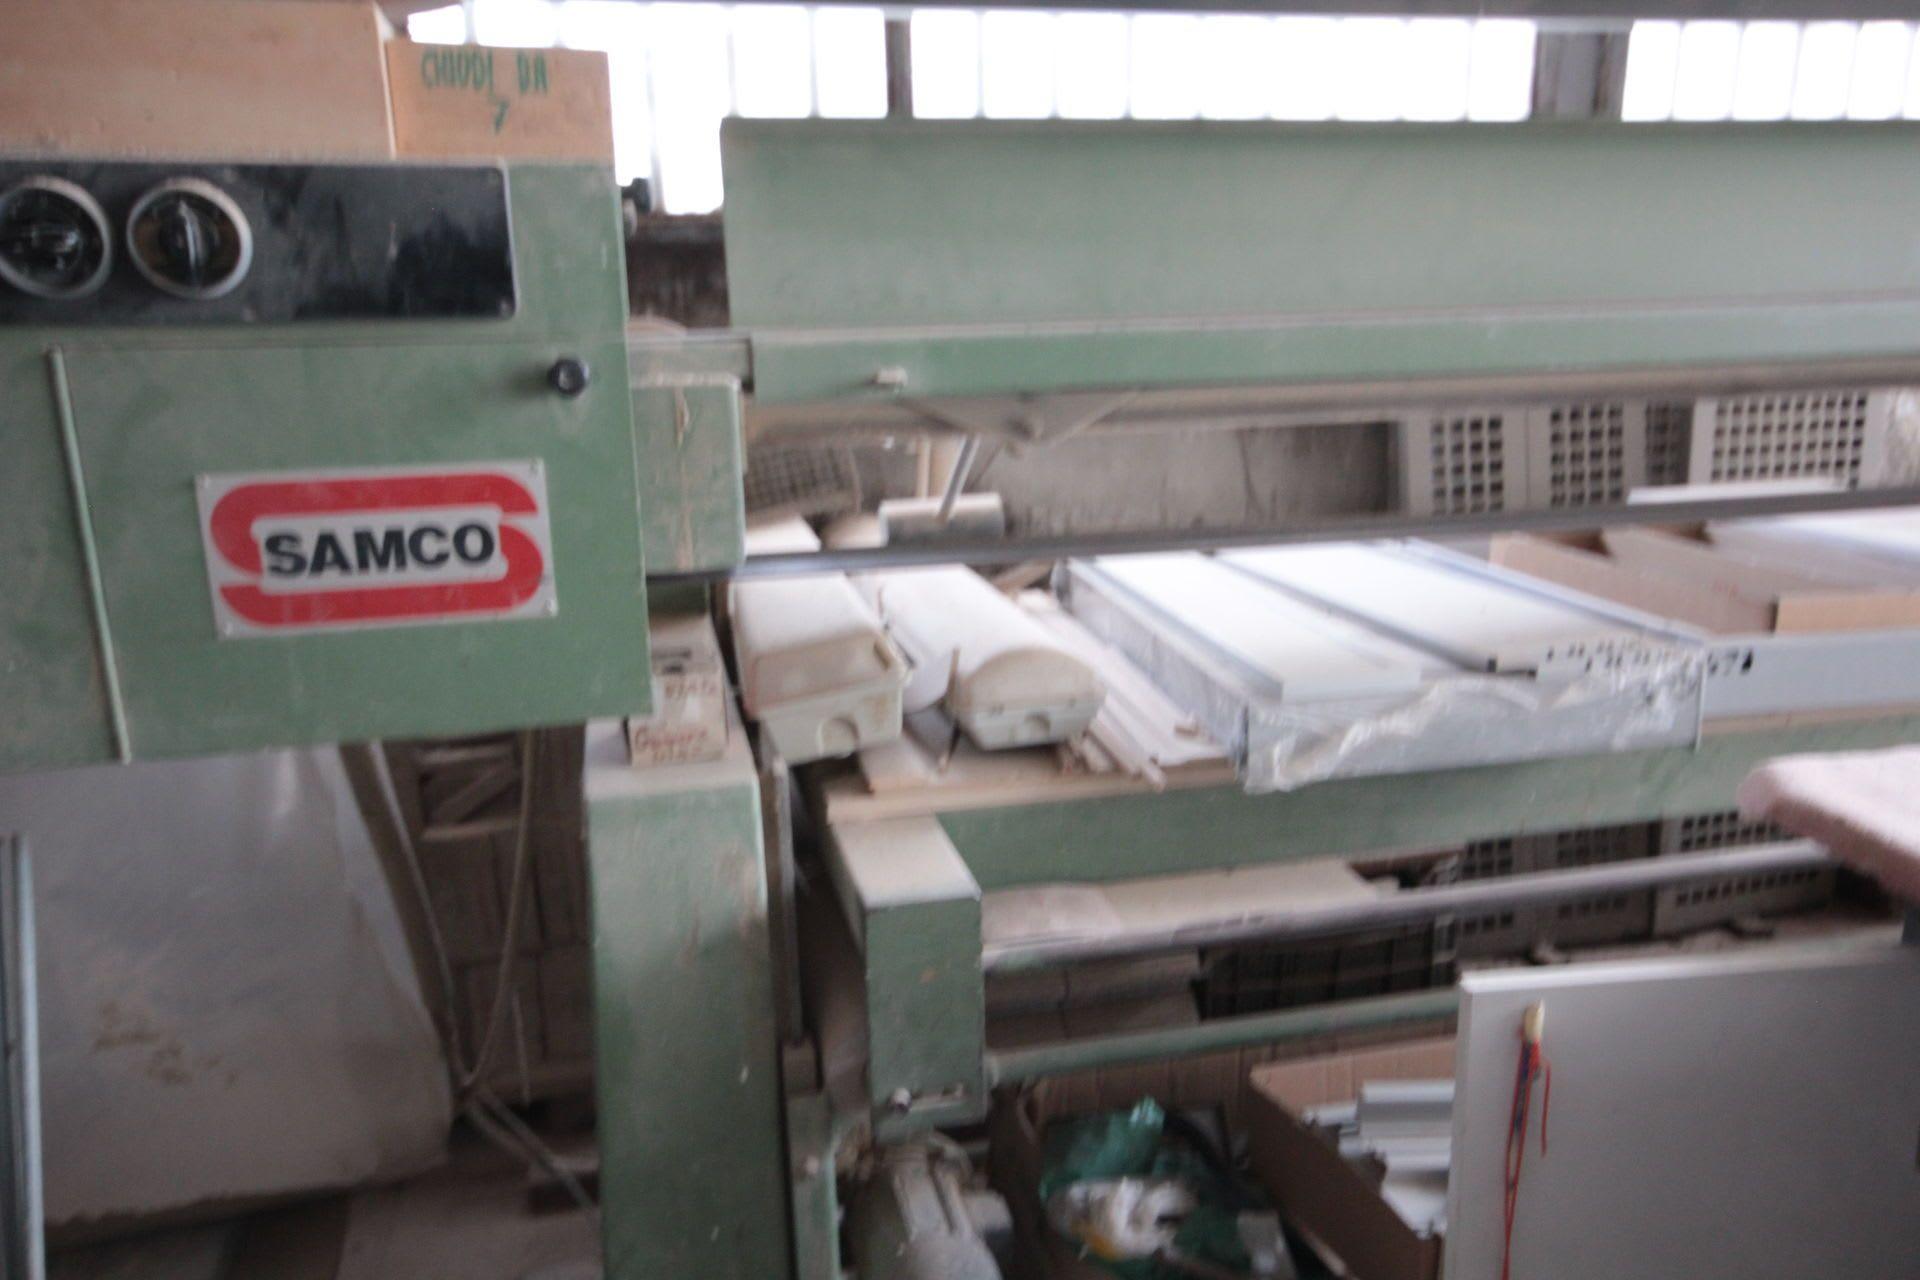 SAMCO Bandschleifmaschine